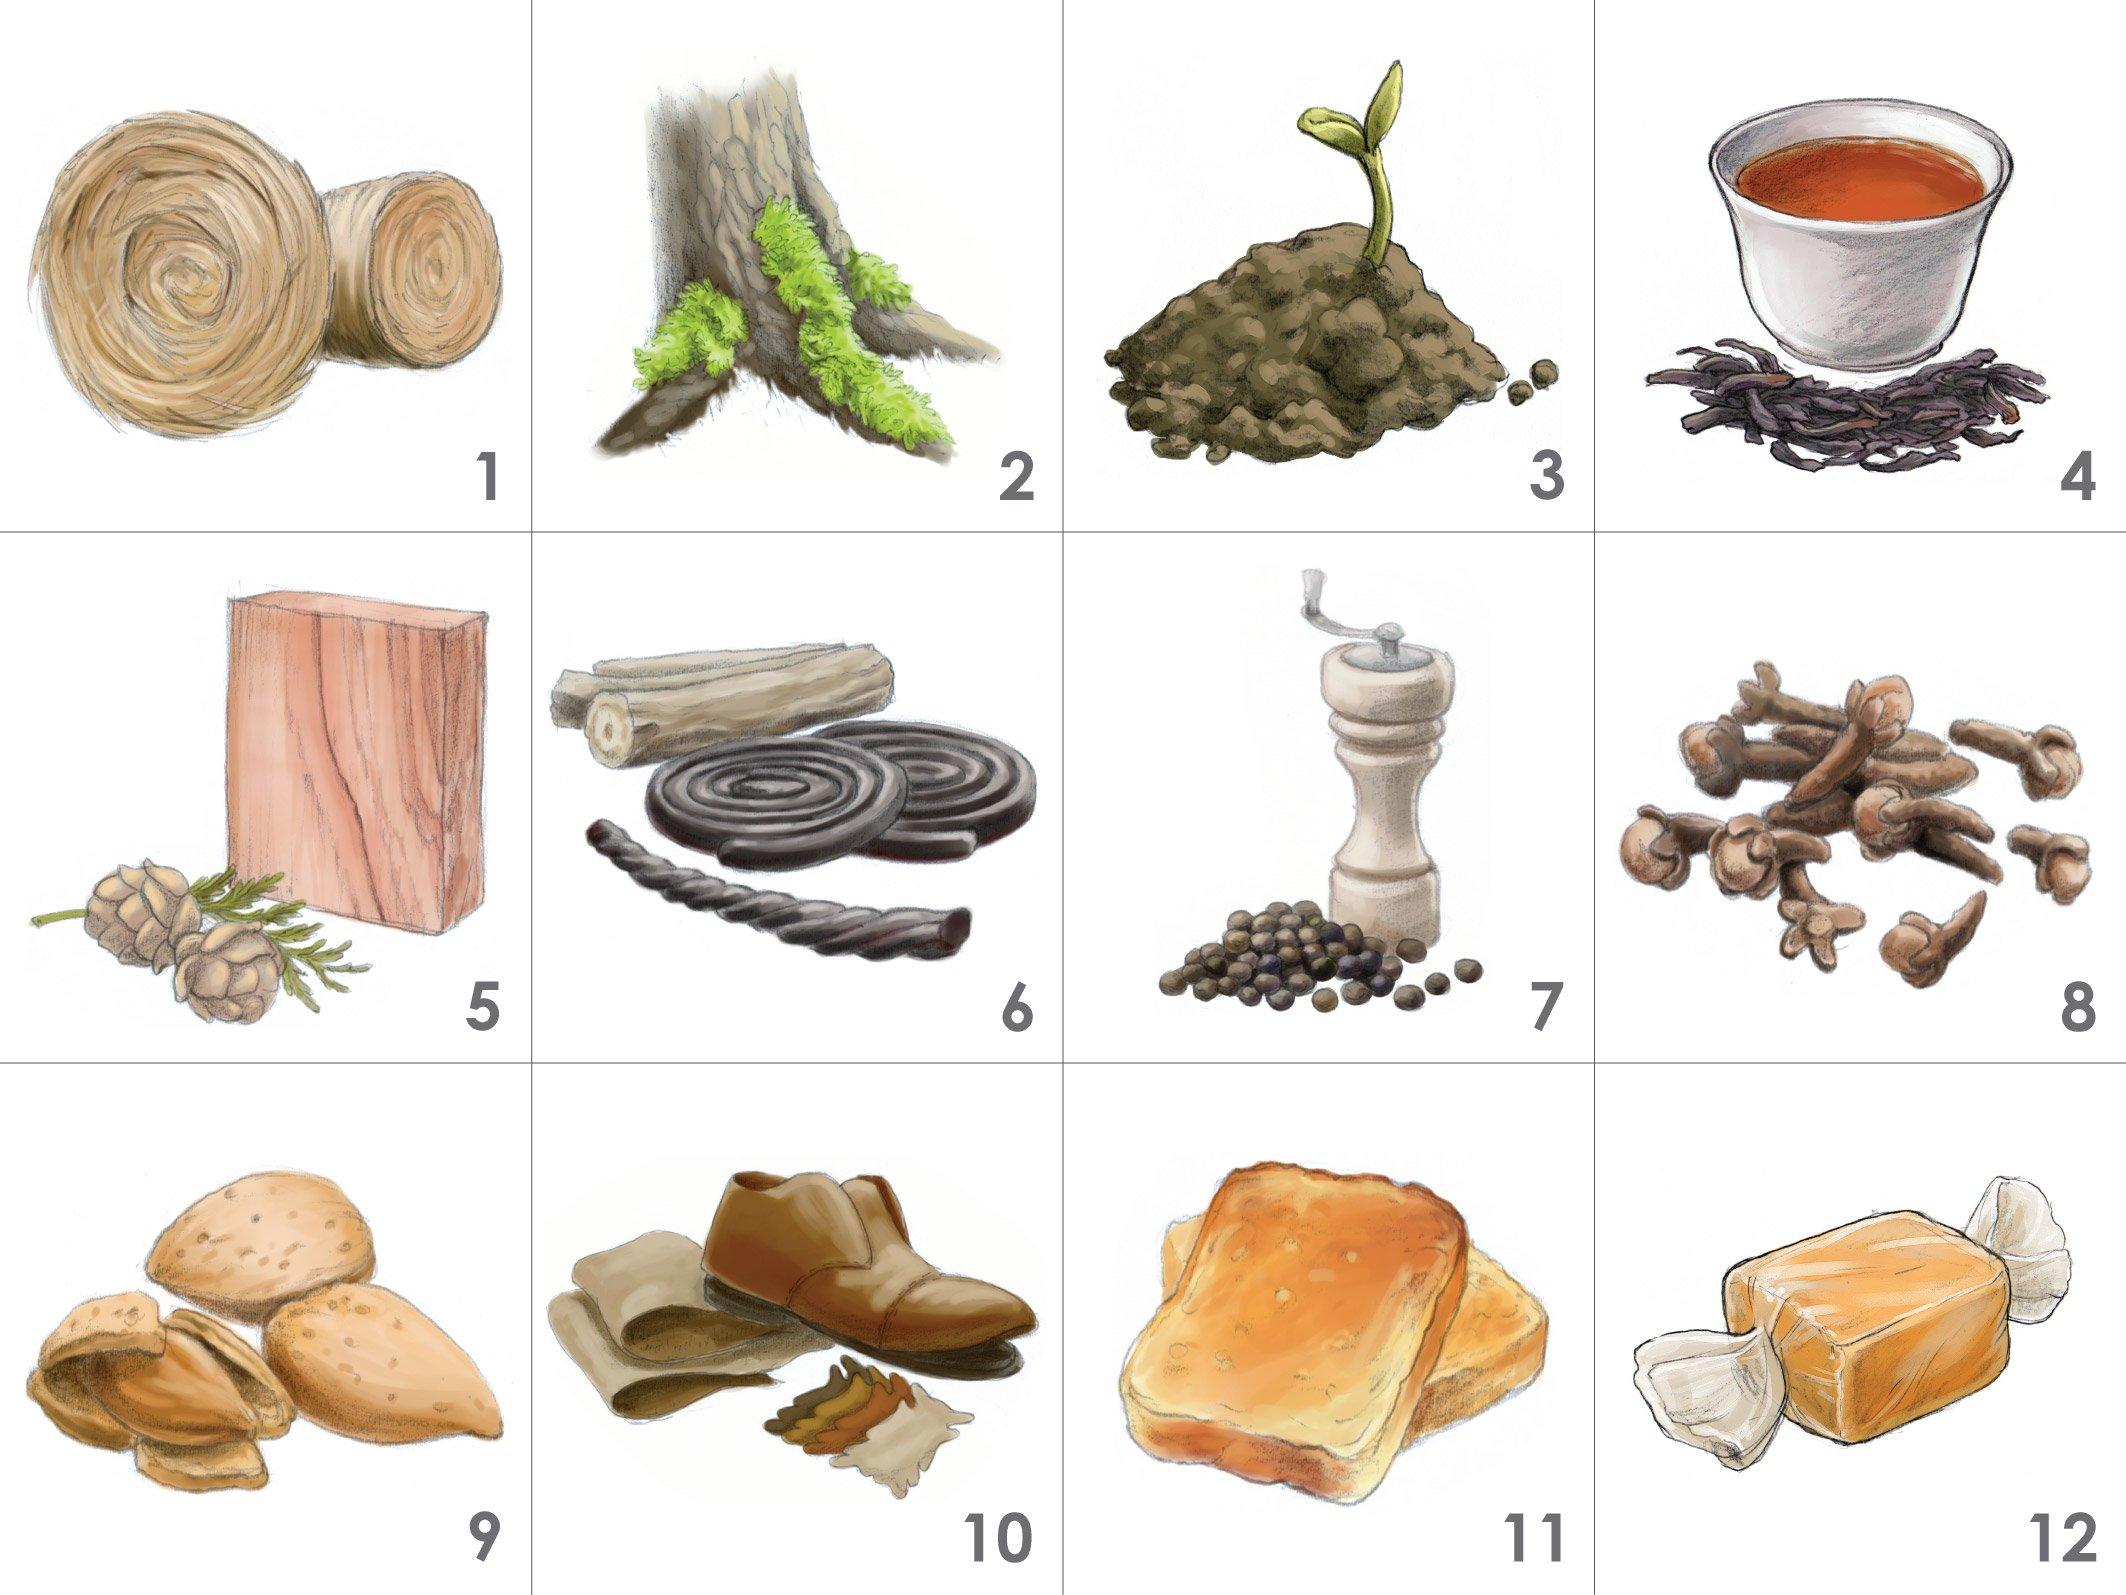 Cigar Aroma Kit - 12 Aromas for Cigar Tasting and Education by Aromaster (Image #3)